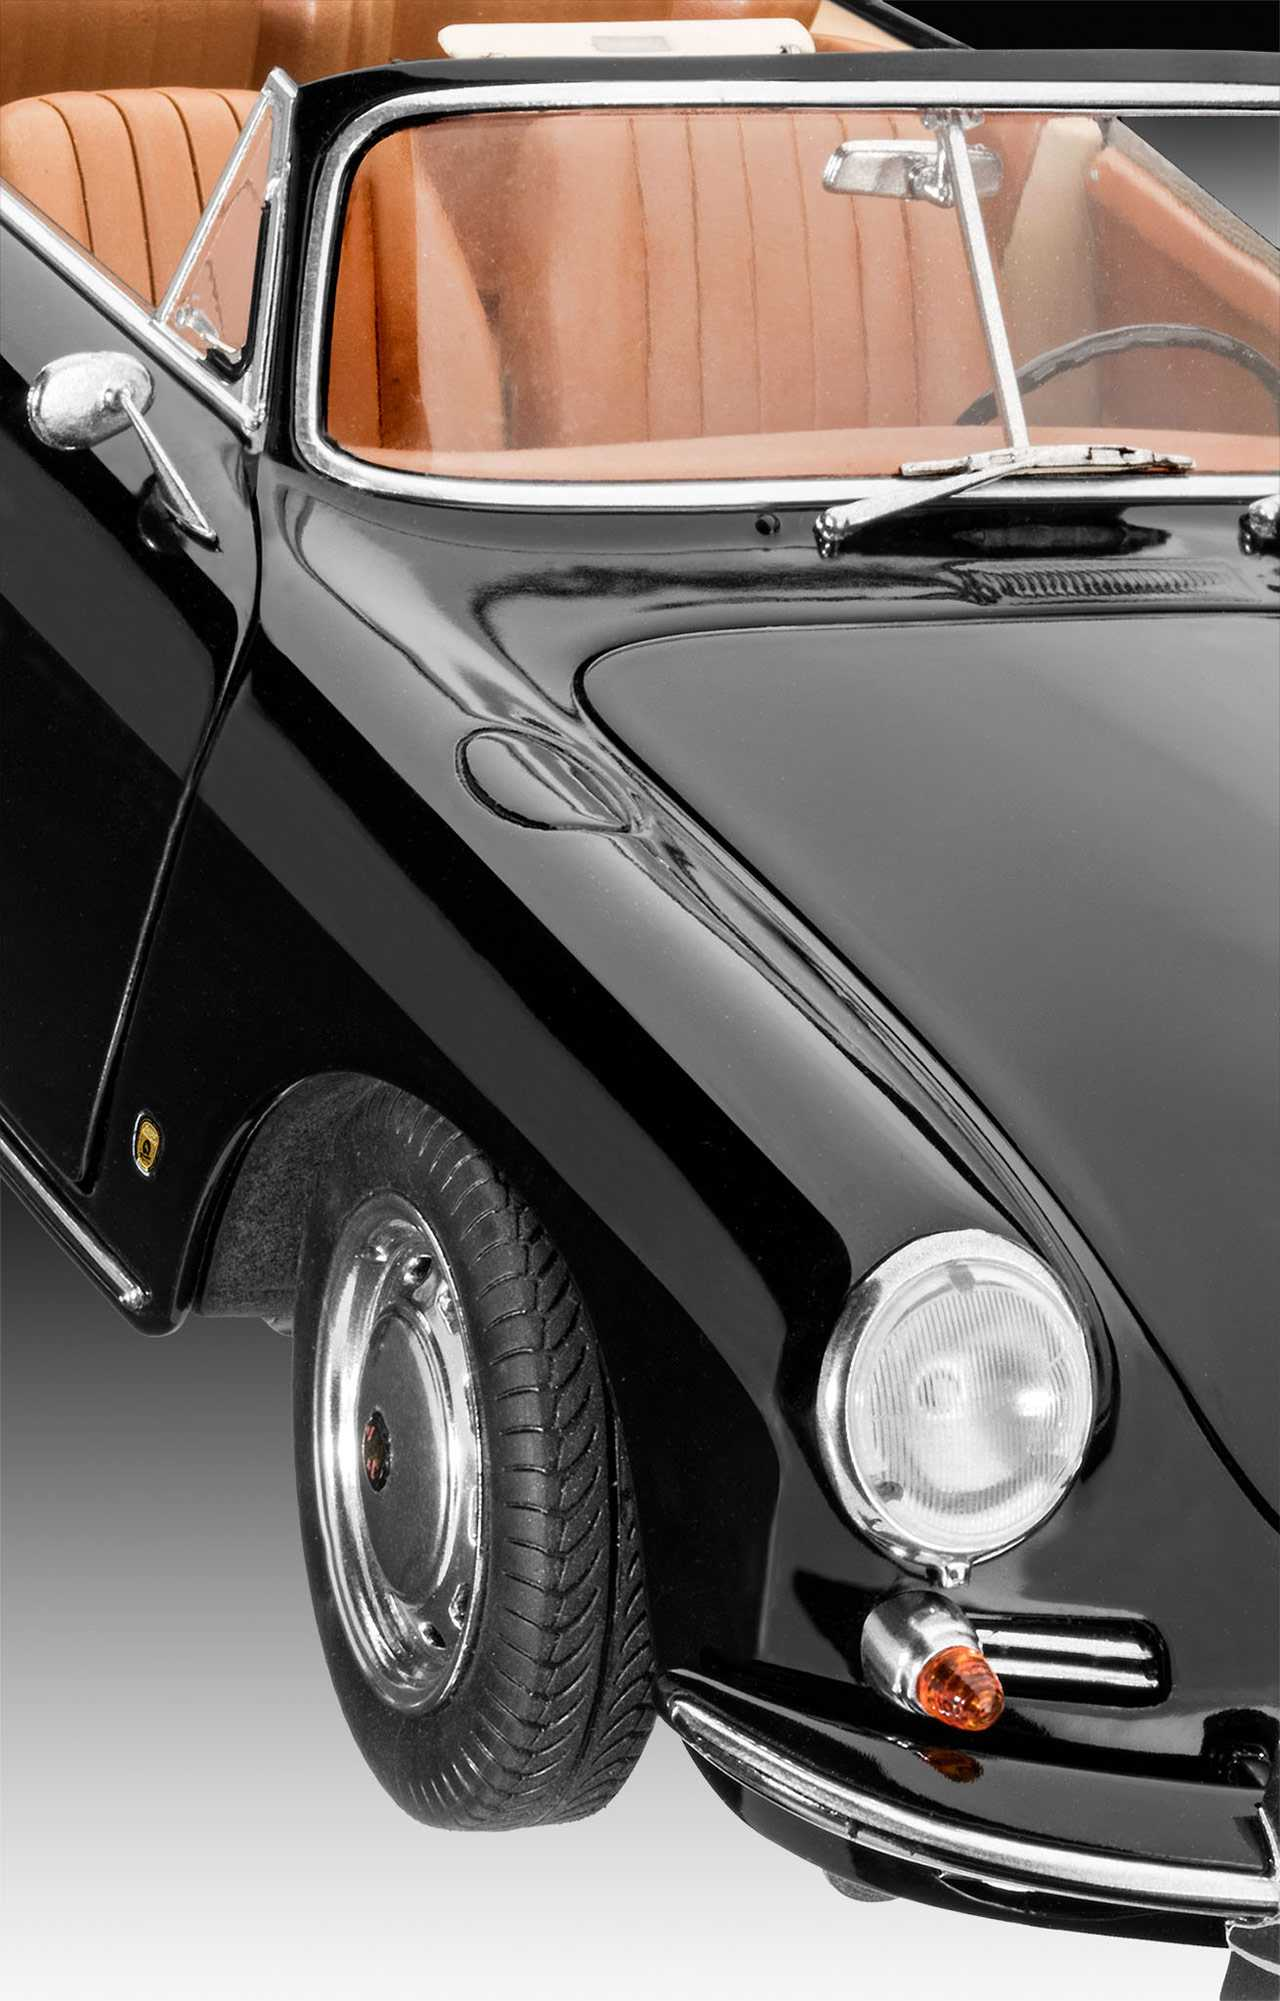 1:16 Porsche 356 Cabriolet